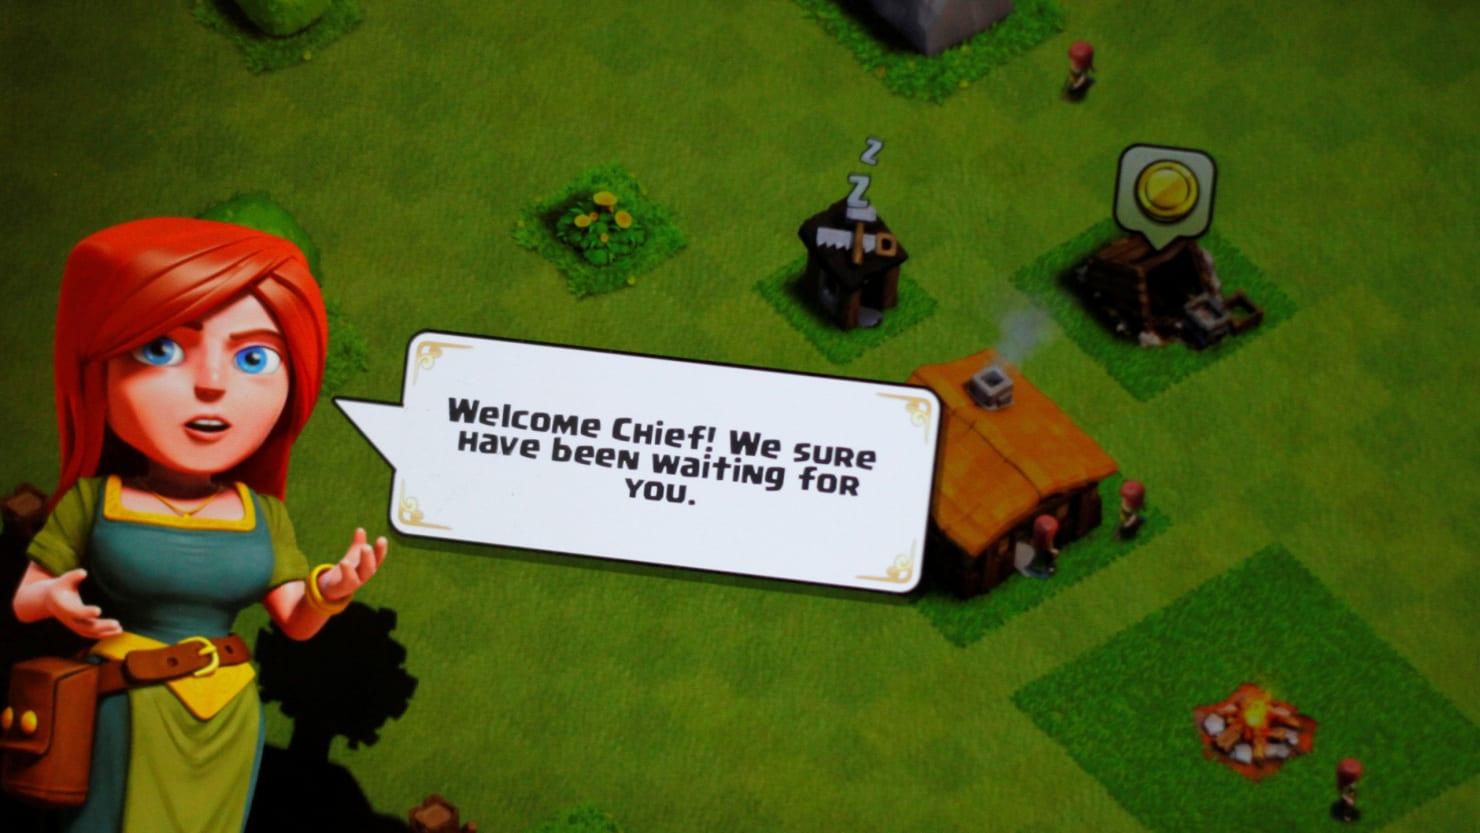 Flipboard: Clash of Clans October update: Magic Hammers, Clan War Leagues rewards revealed  Flipboard: Clas...